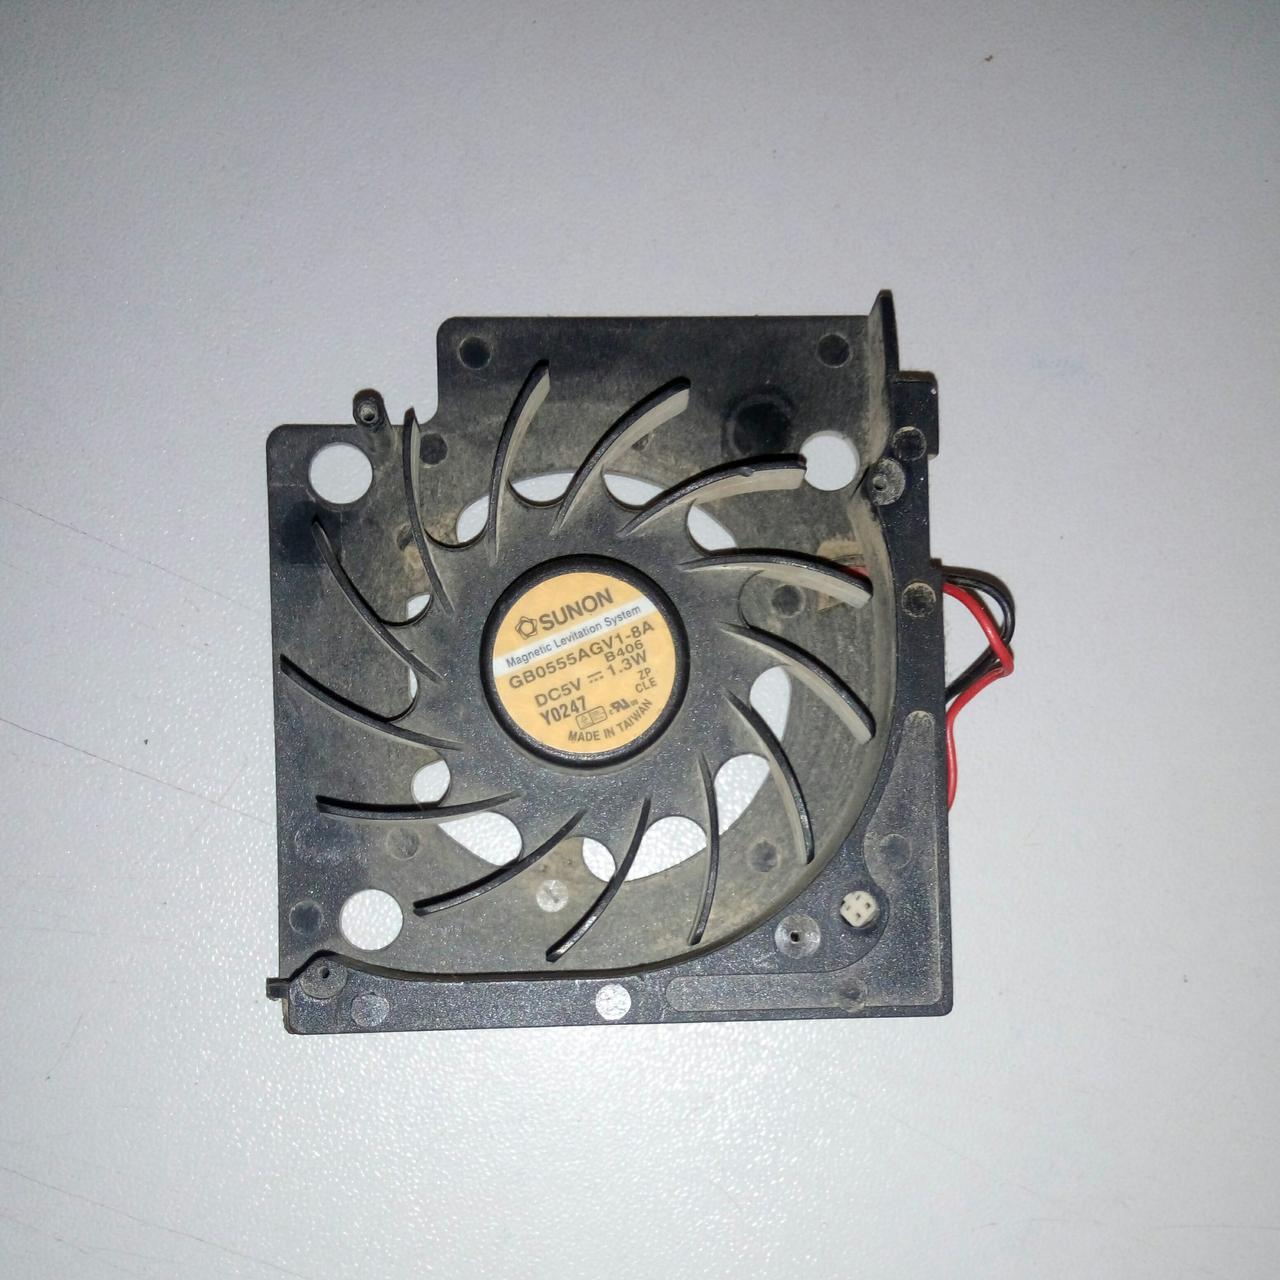 Кулер для ноутбука DELL Precision M60 (AB0605HB-E03)